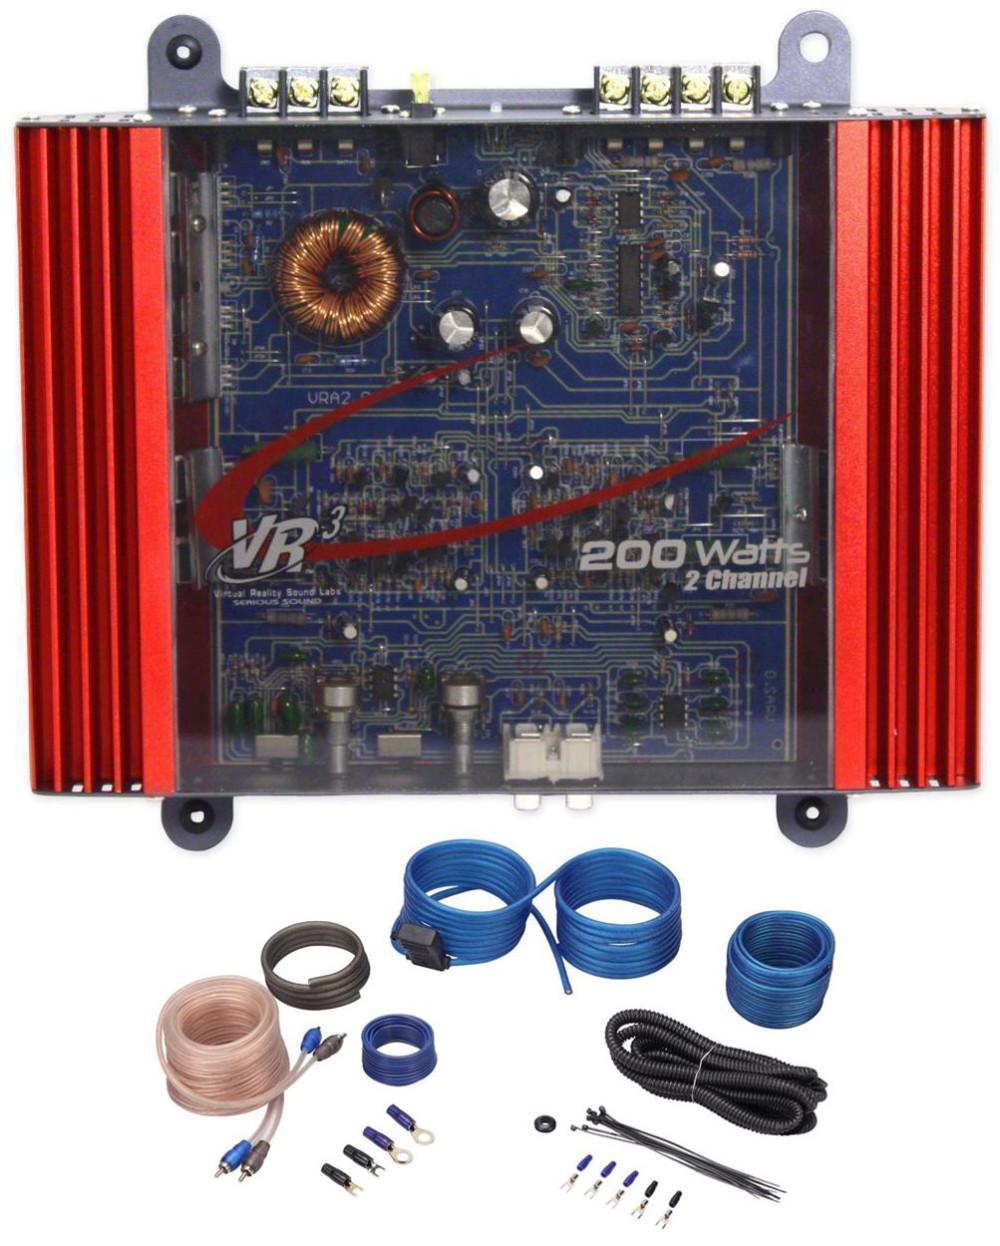 VR3 VRA2.0 100 Watt RMS 200 Watt Peak 2 Channel Car Amplifier + Amp Kit |  Audio Savings | Vr3 Car Stereo Wire Harness |  | Audio Savings